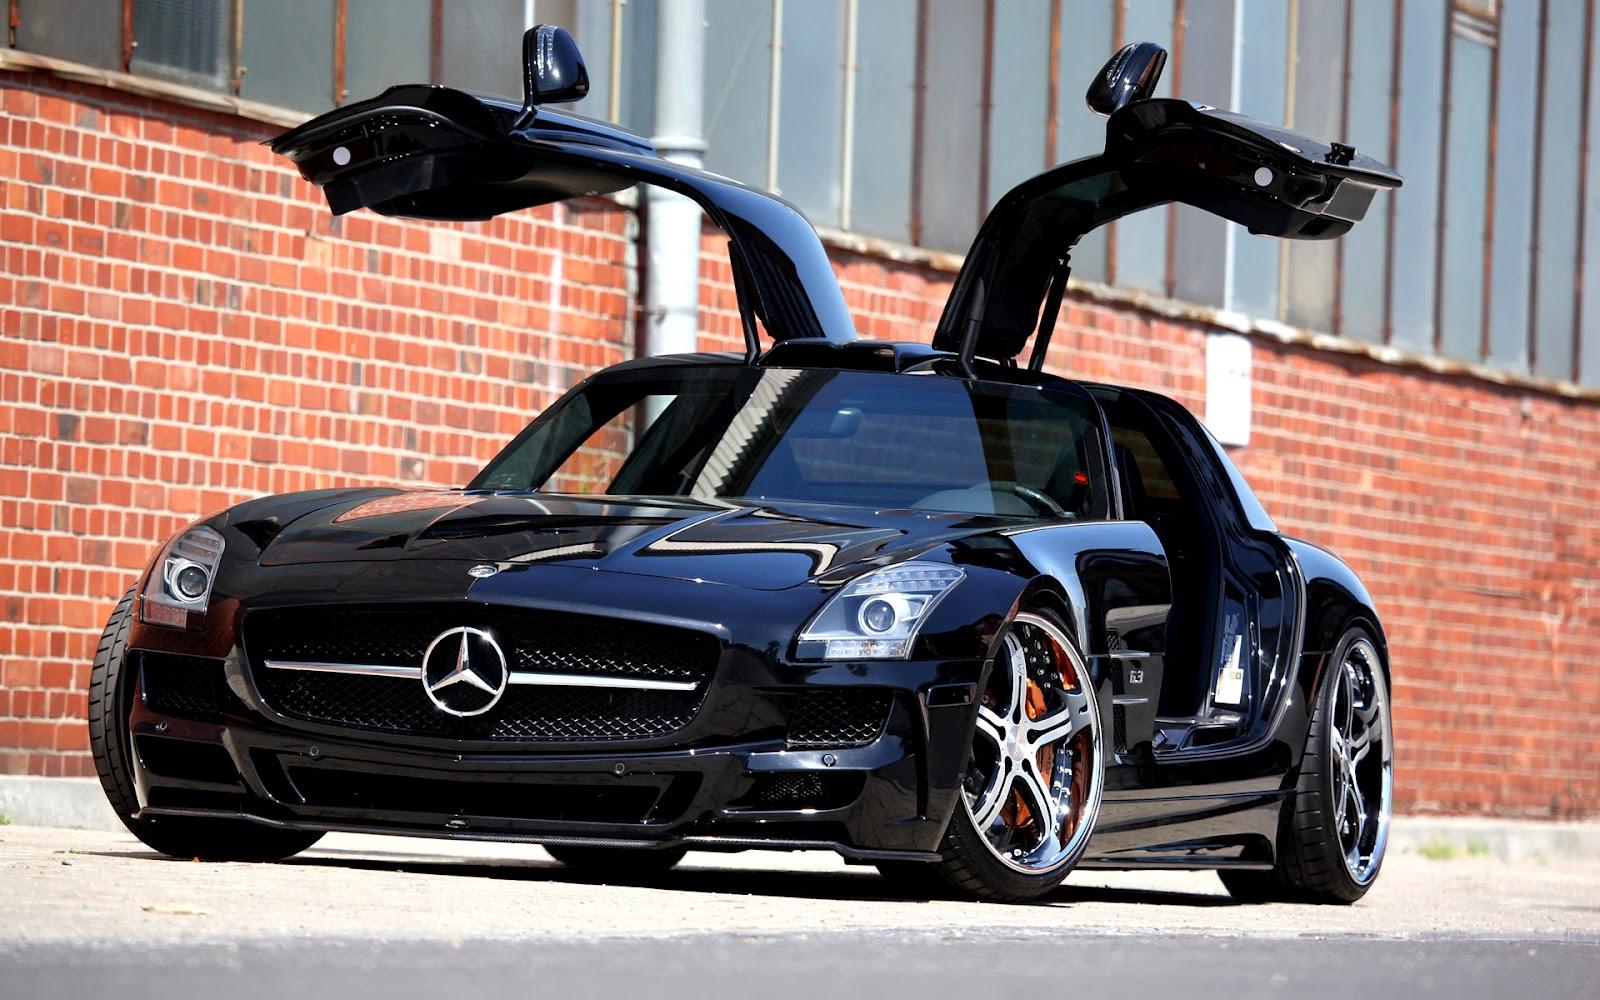 http://3.bp.blogspot.com/-H50Zq1pUMyU/T51zpLRntKI/AAAAAAAAbKA/TsDY6qFEQlc/s1600/Mercedes-Benz-AMG-SLS_10.jpg